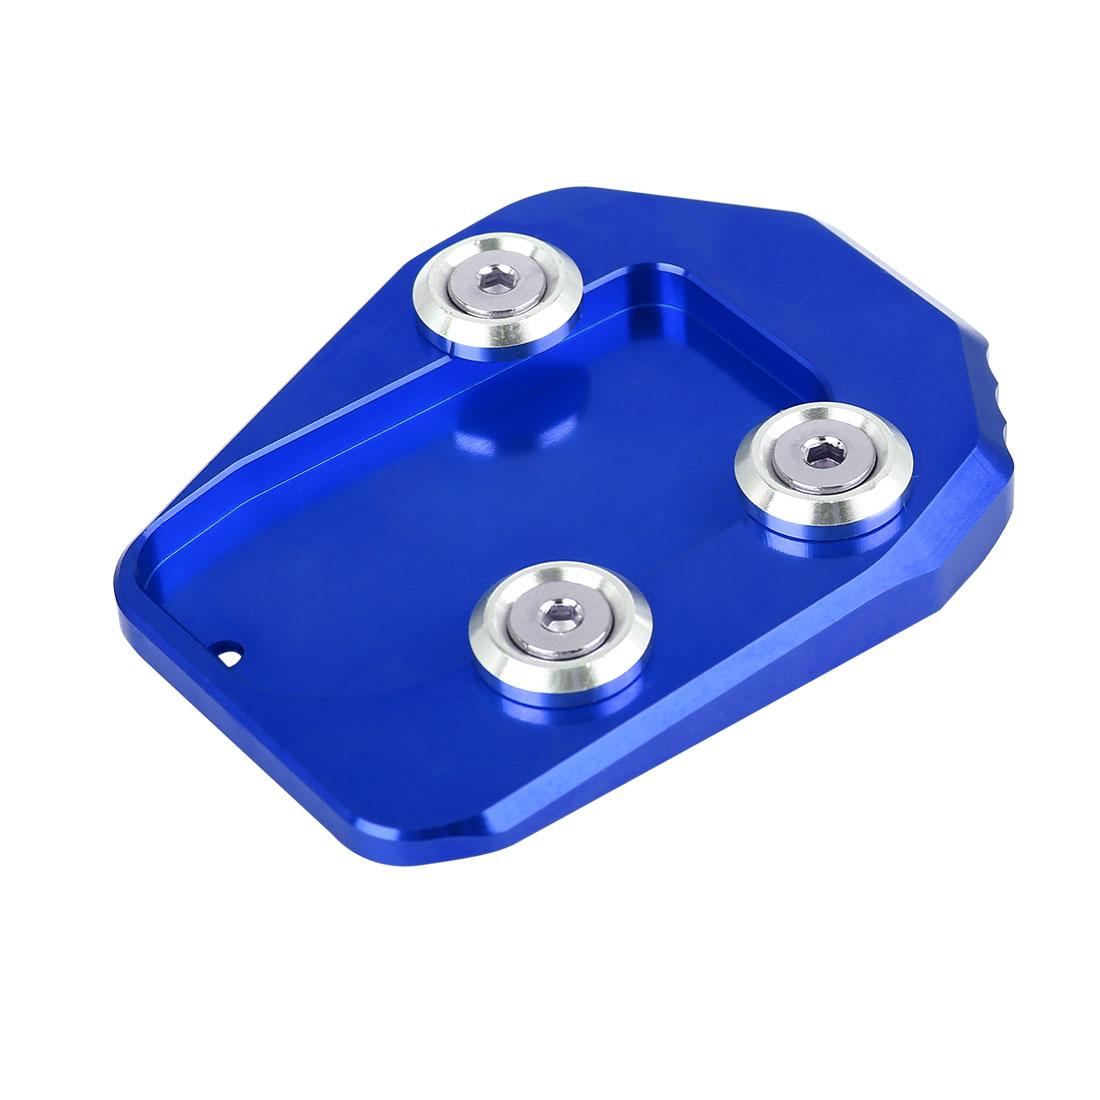 Blue Aluminium Alloy Nonslip Kickstand Enlarger Pad for Yamaha MT-09 FZ-09